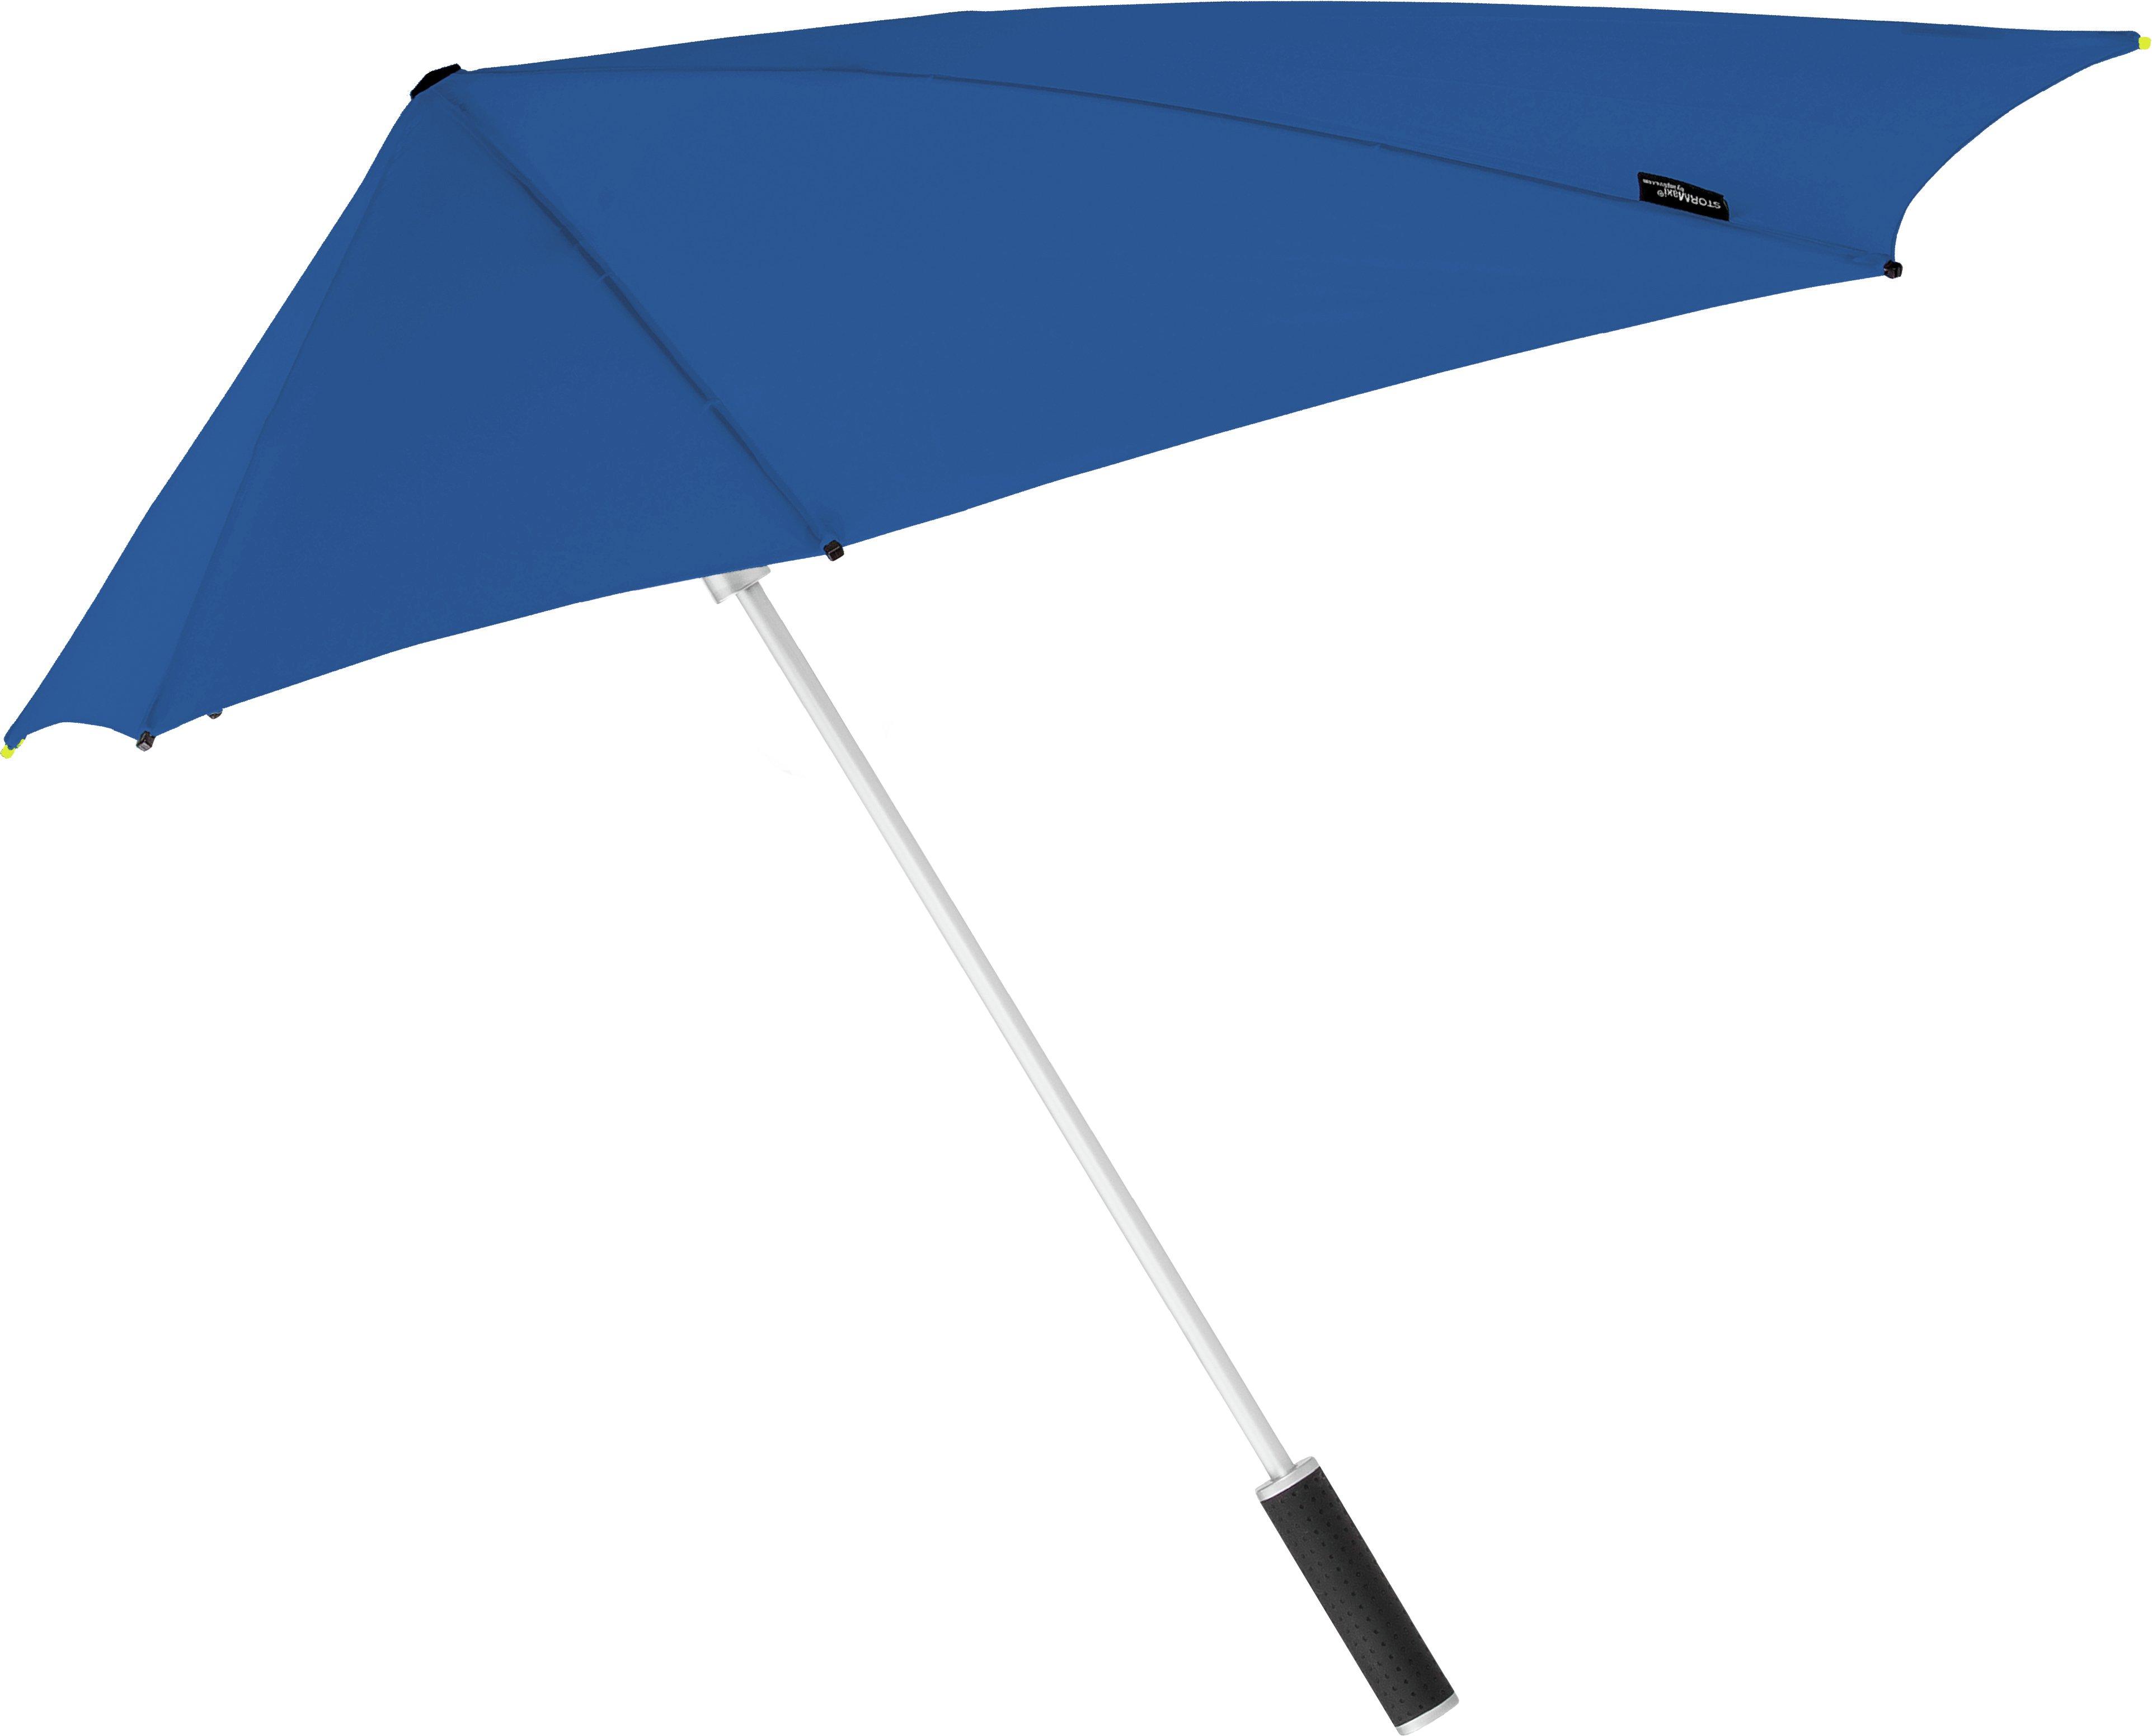 Stealthbomber Umbrella - Royal Blue.